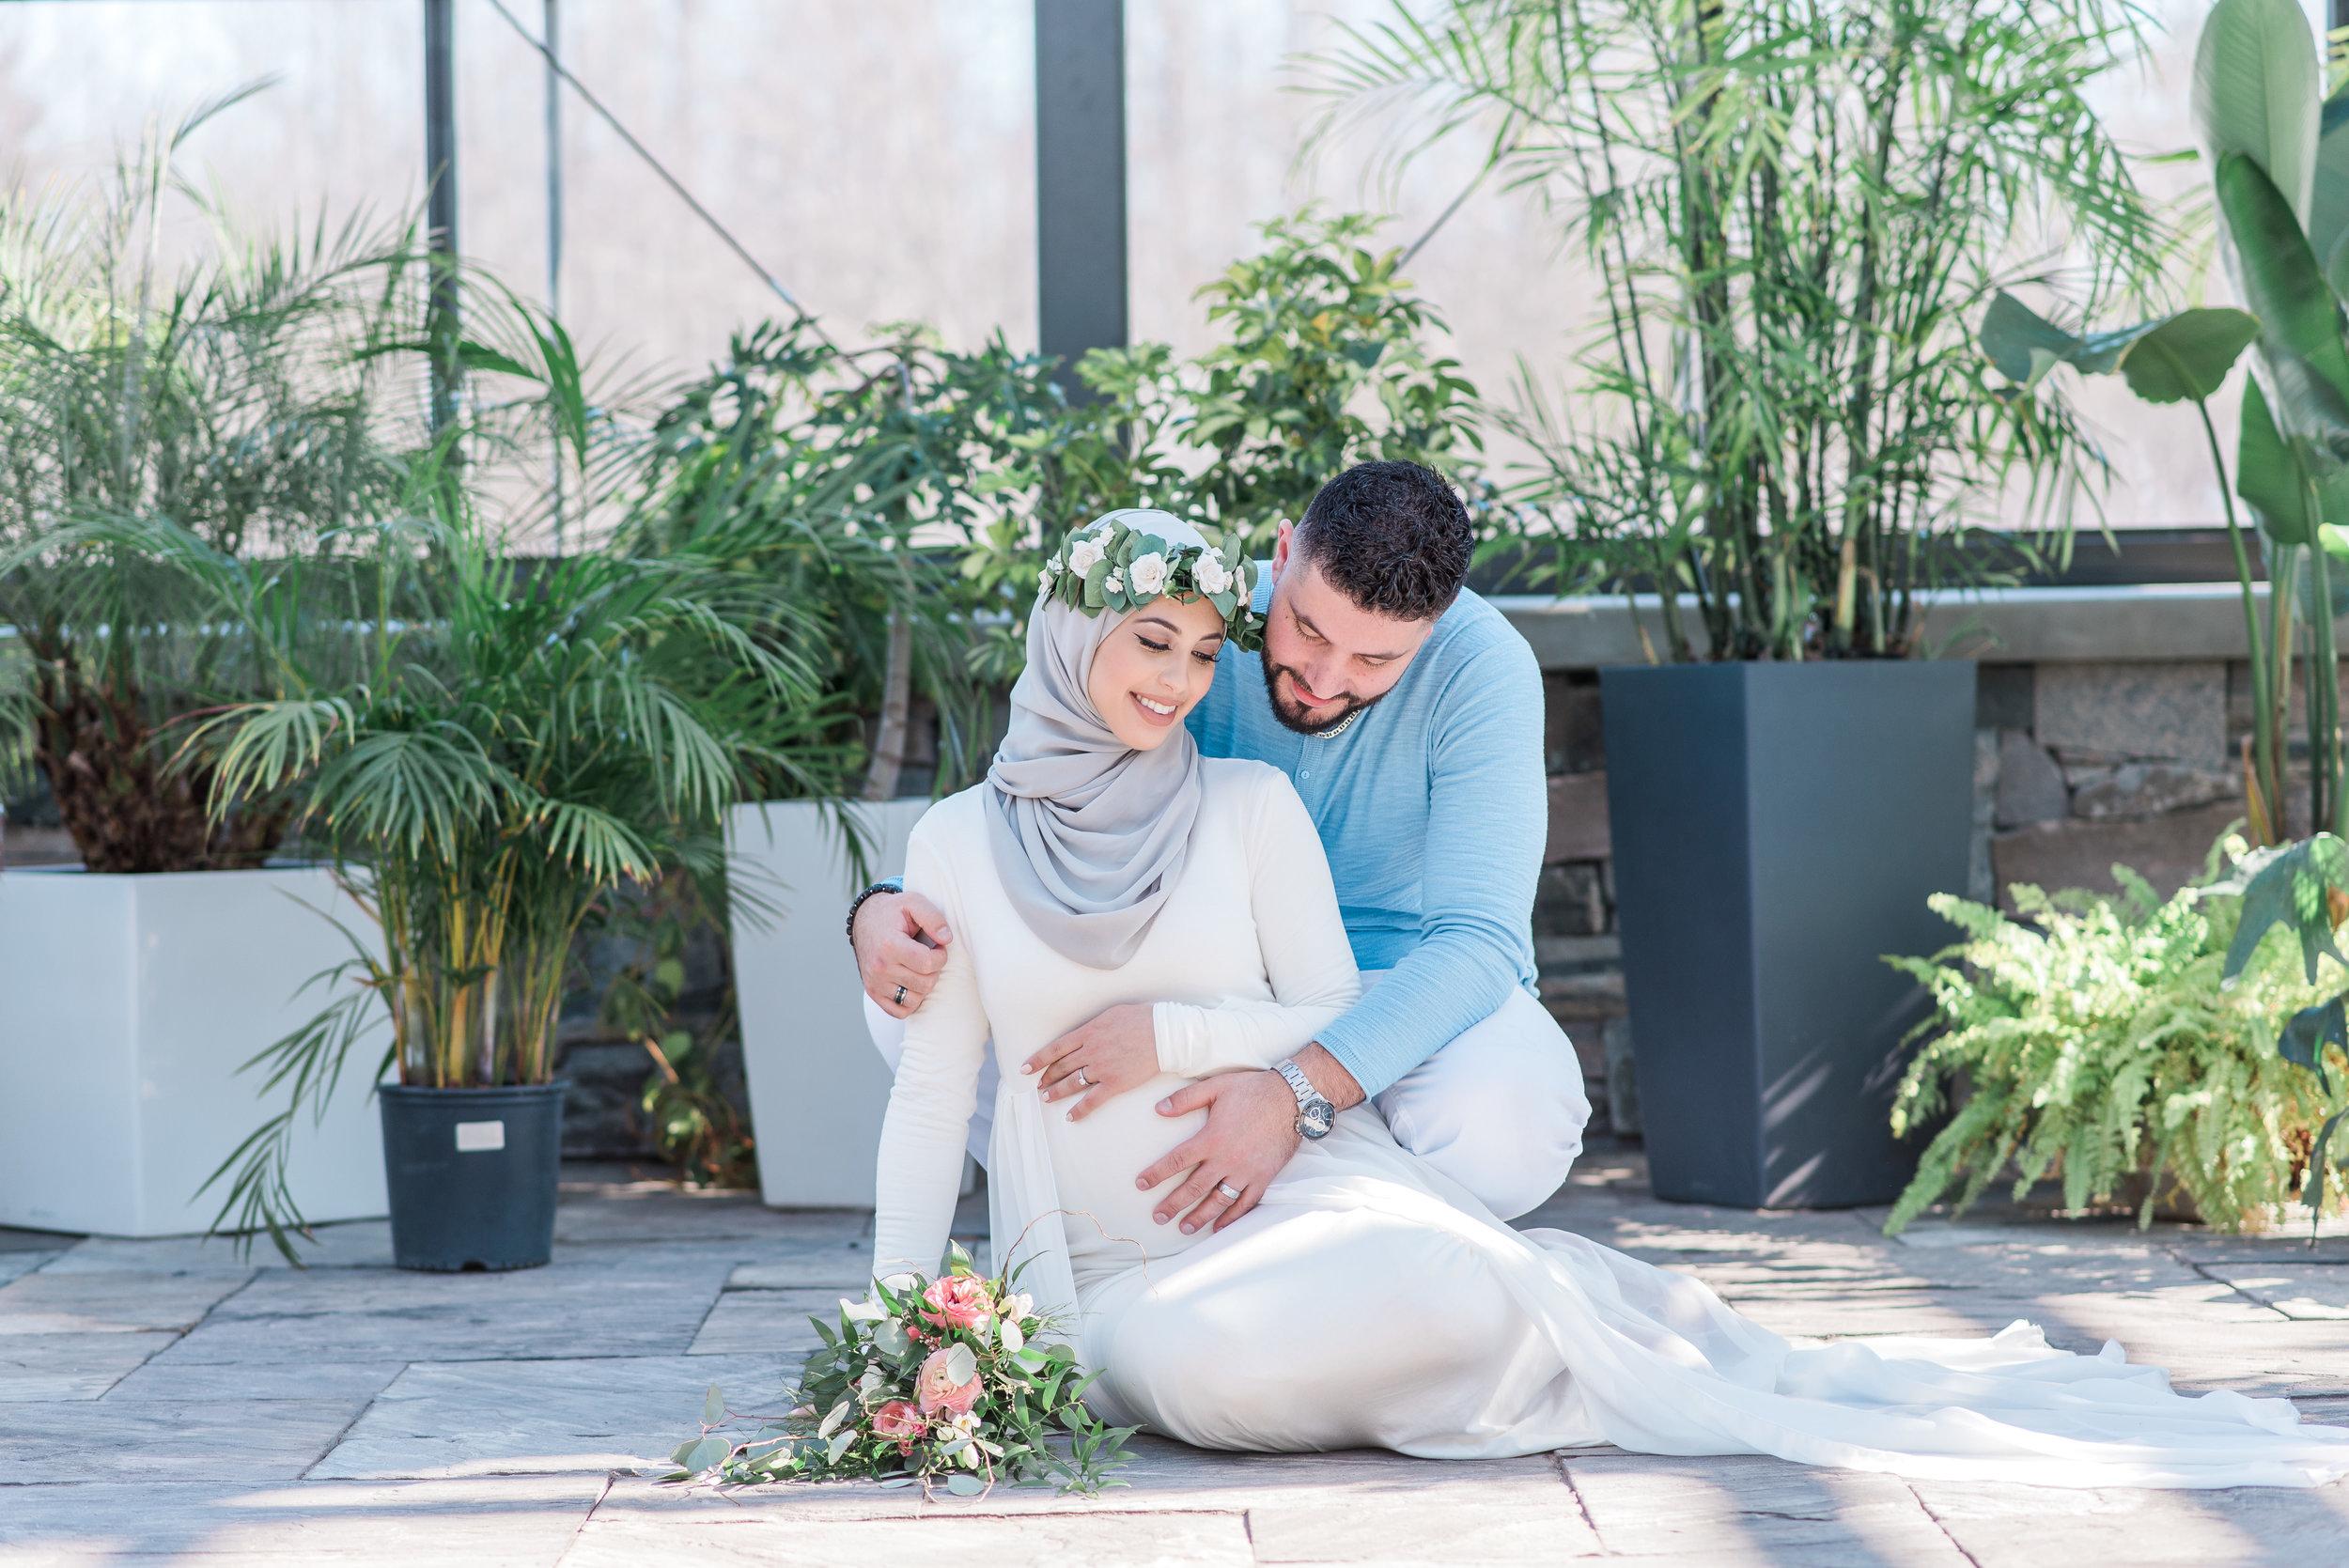 Hanan Tehaili Maternity Shoot White Dress Aquatopia.jpg